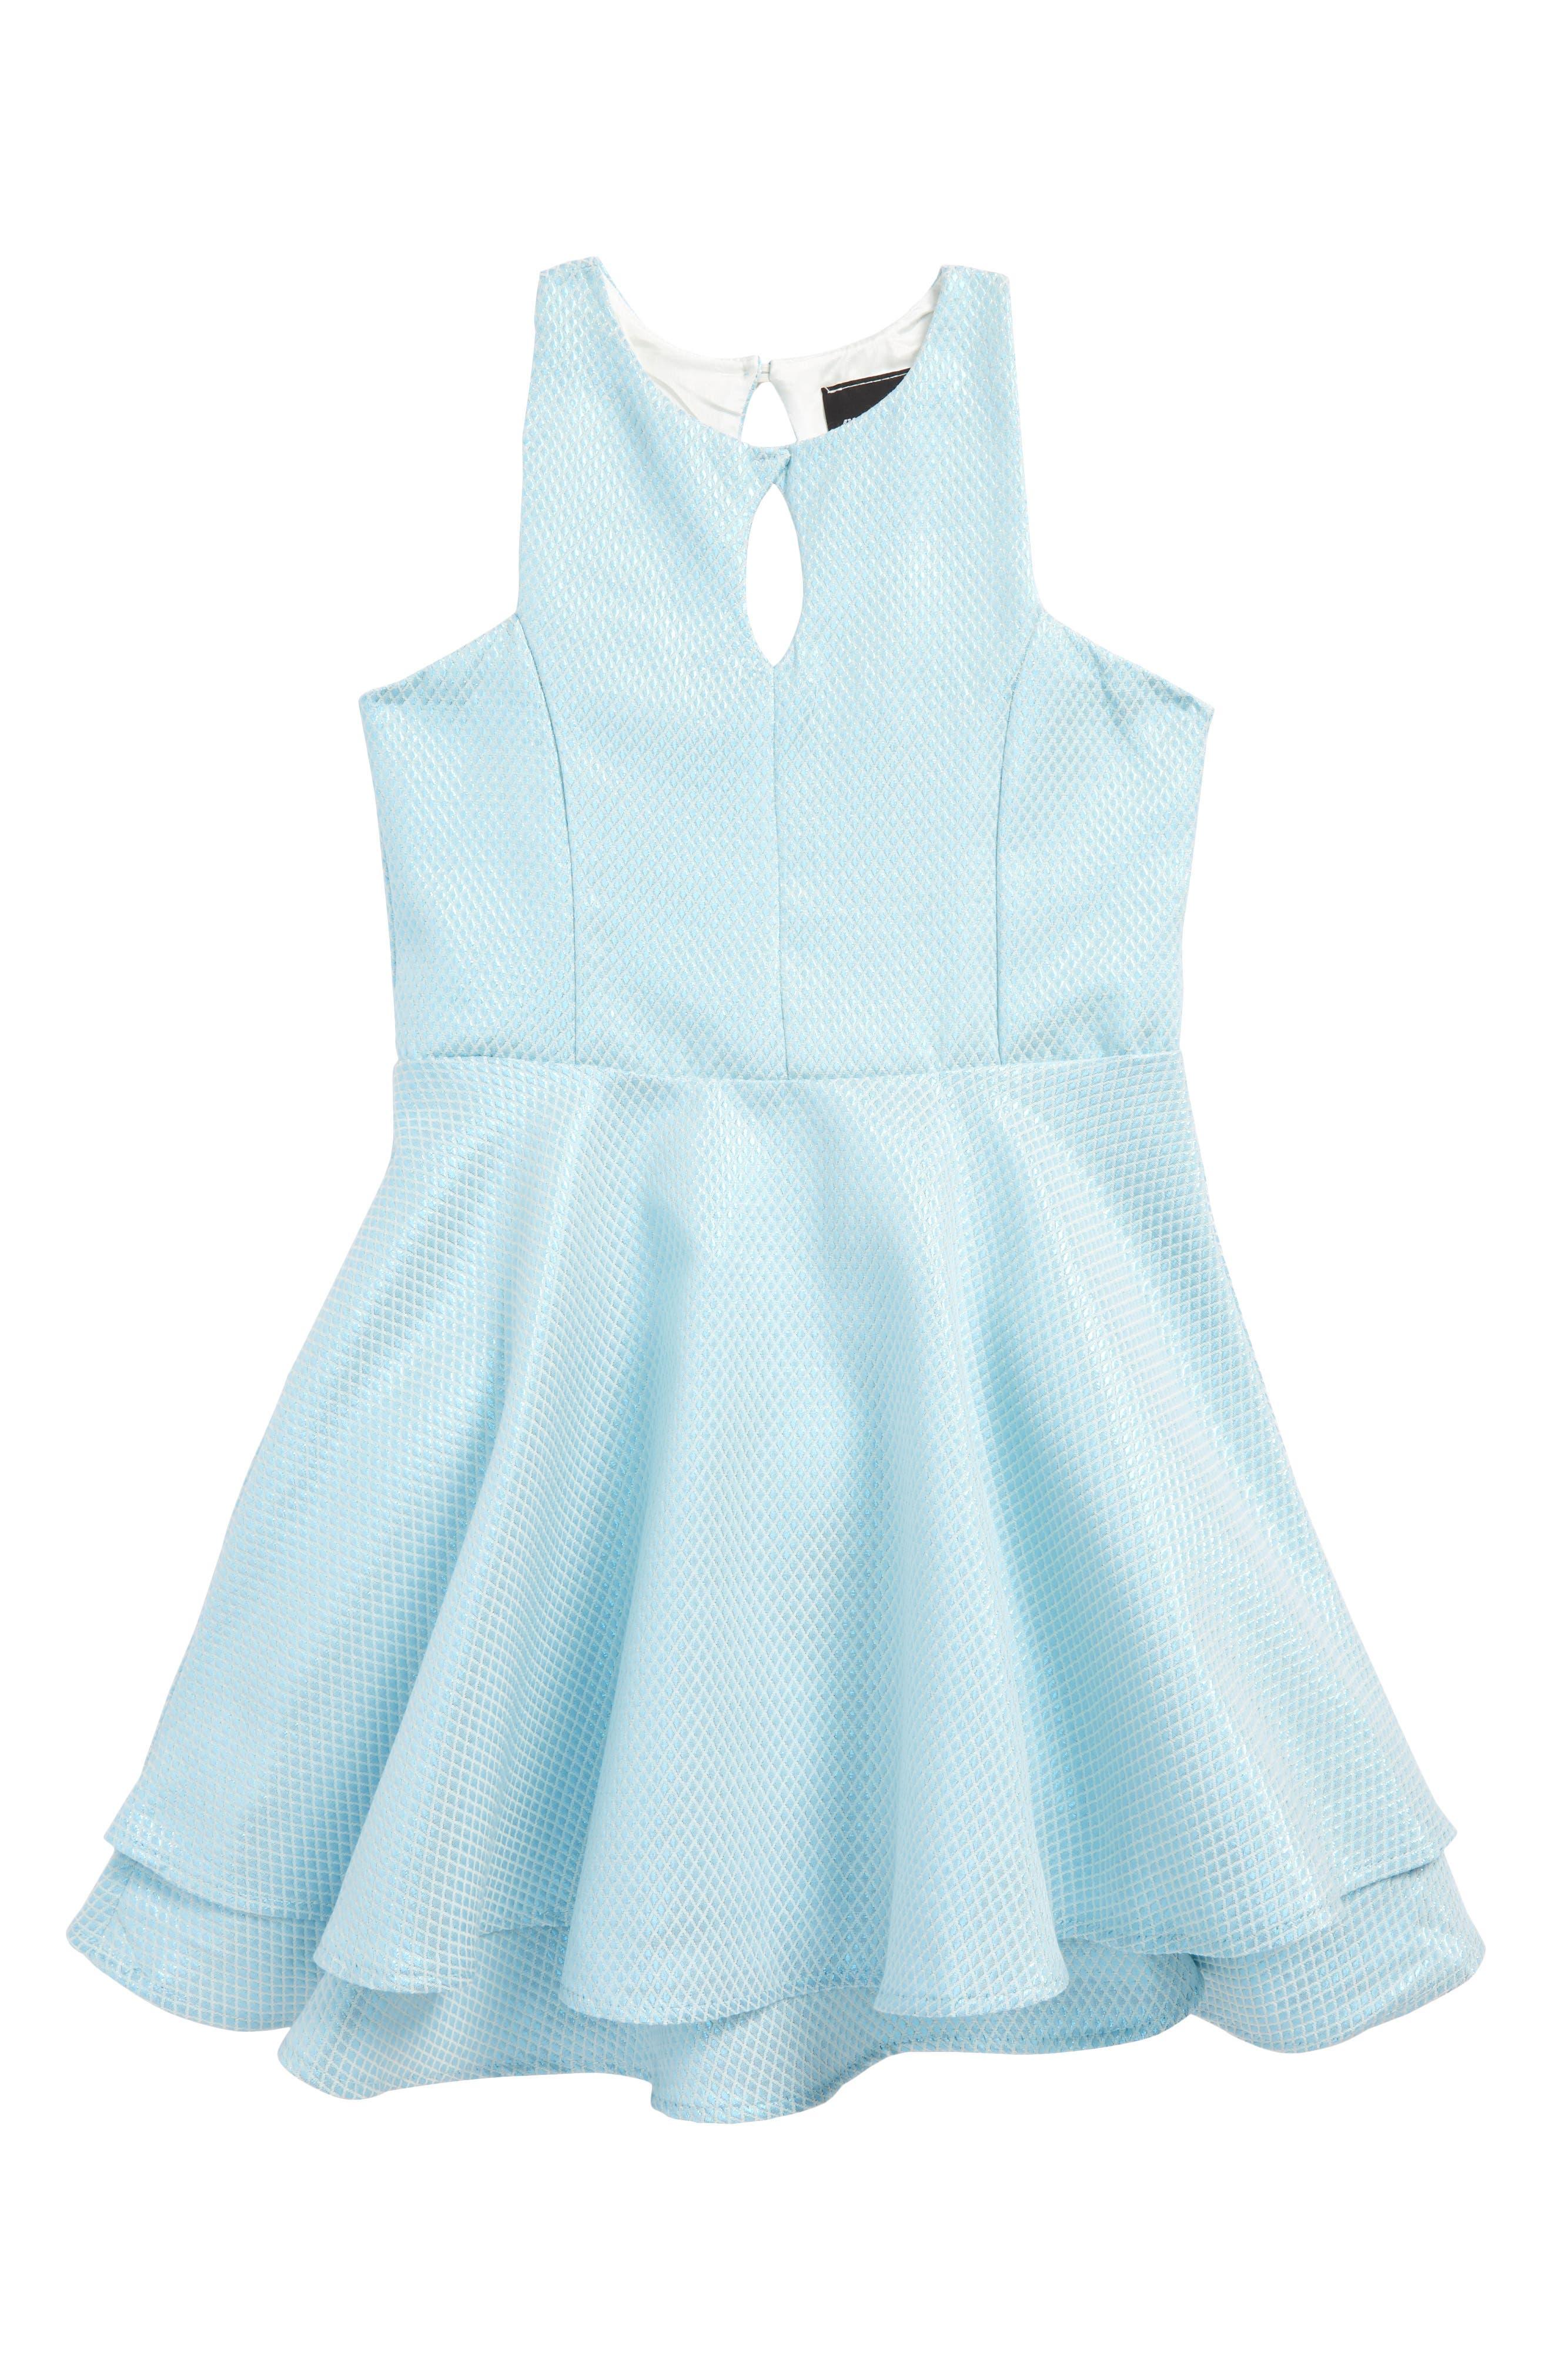 Sleeveless Party Dress,                         Main,                         color, Blue